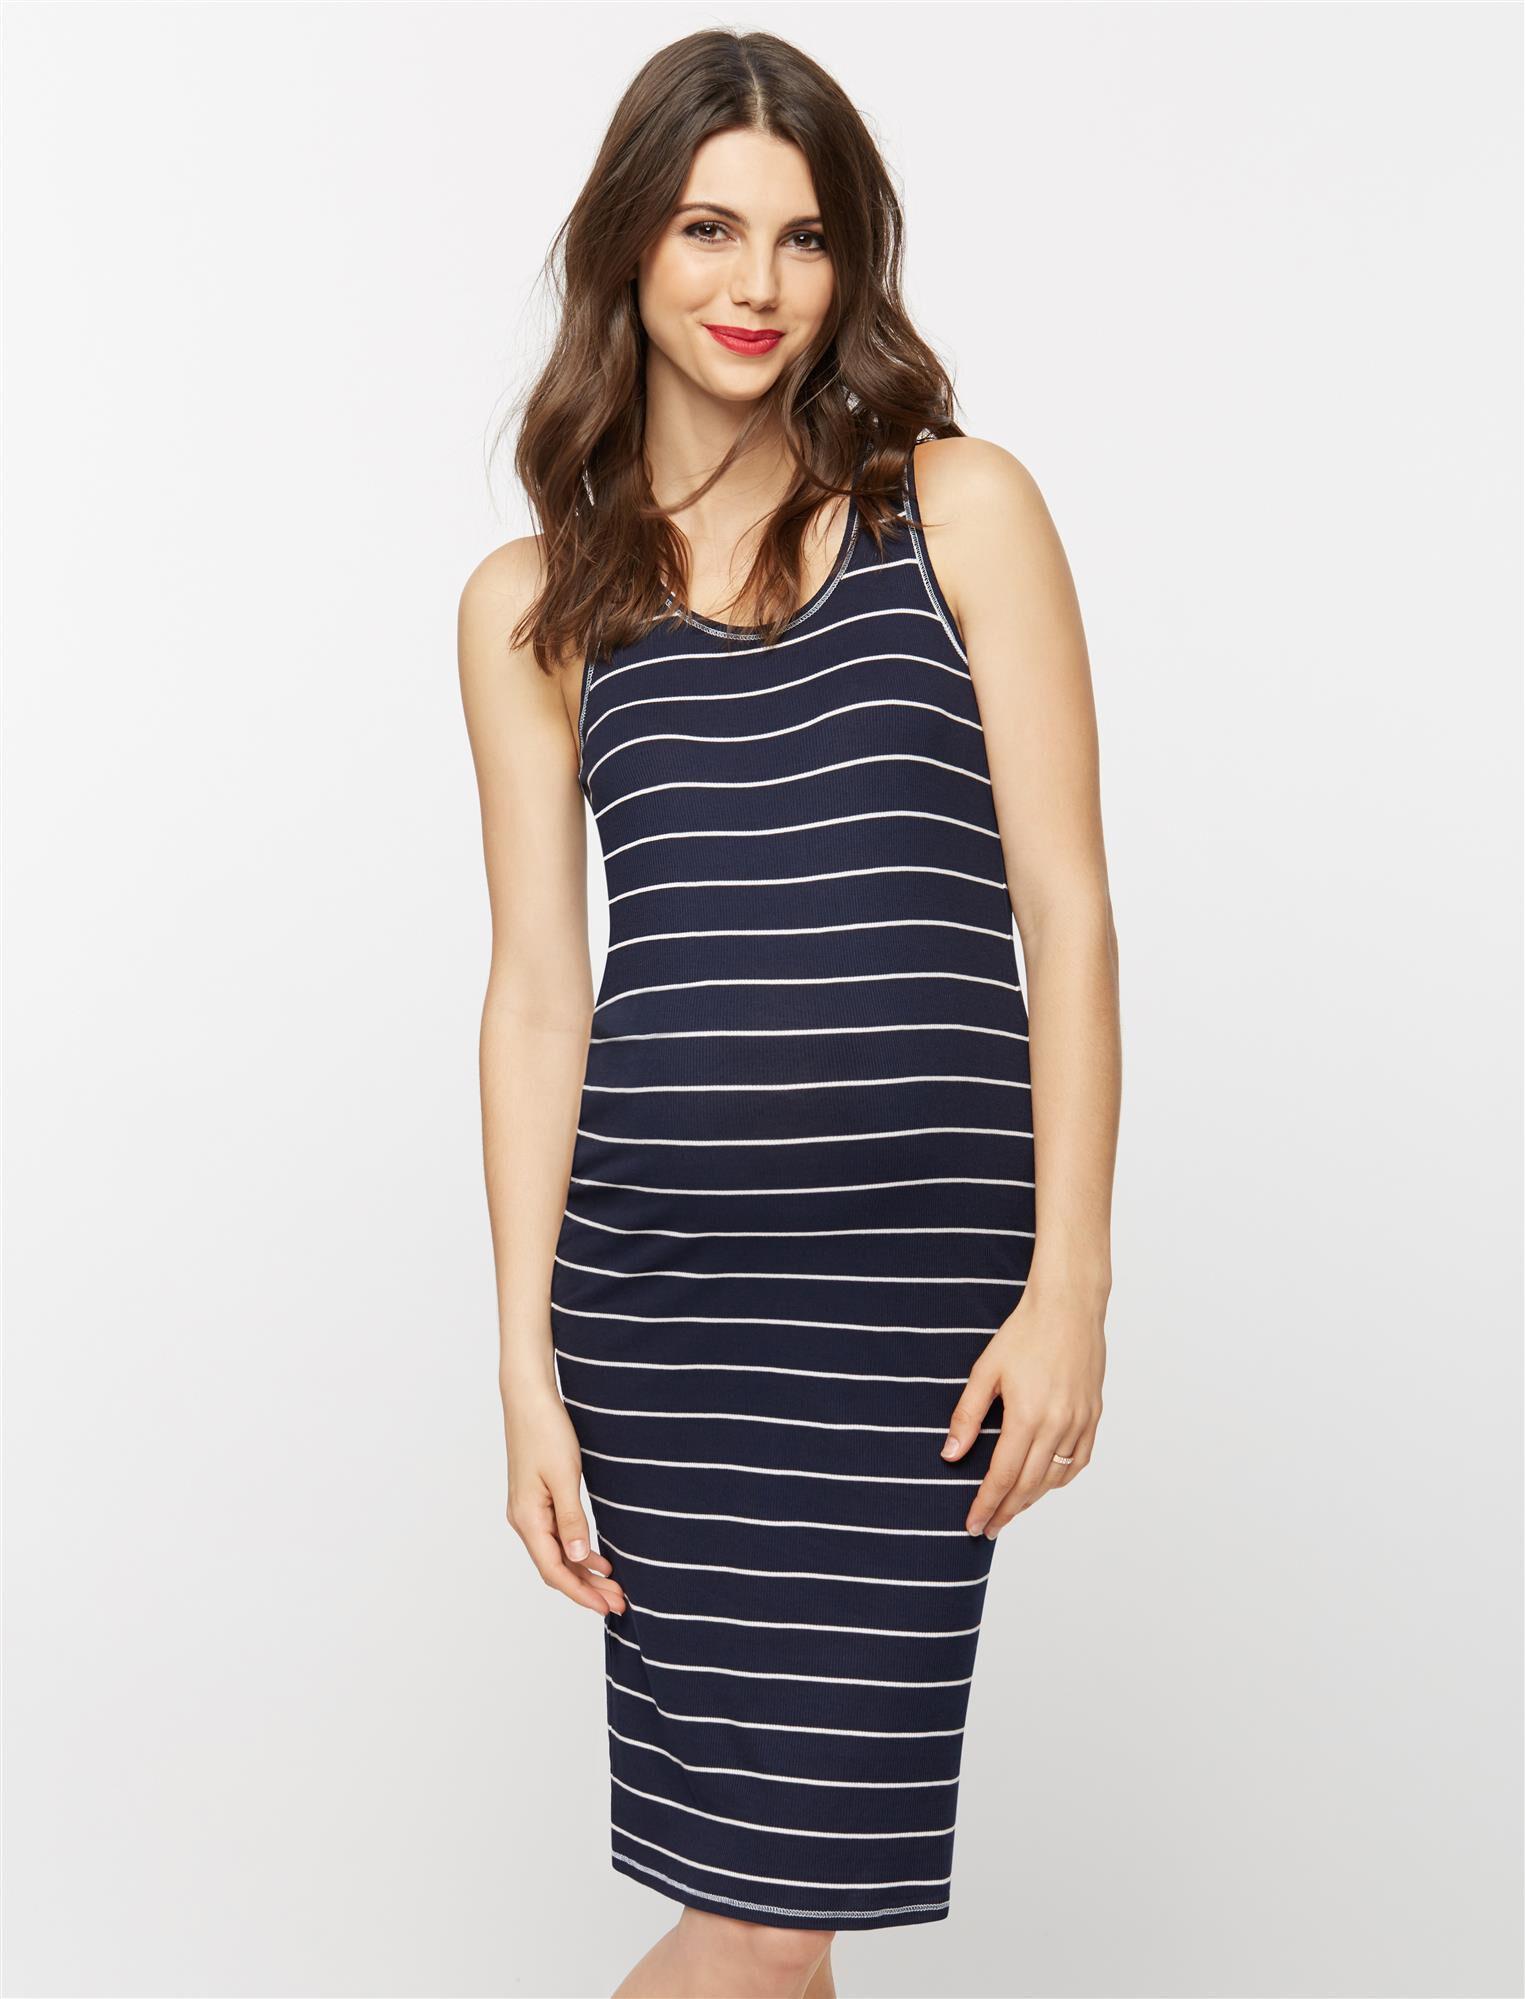 Racerback Maternity Dress